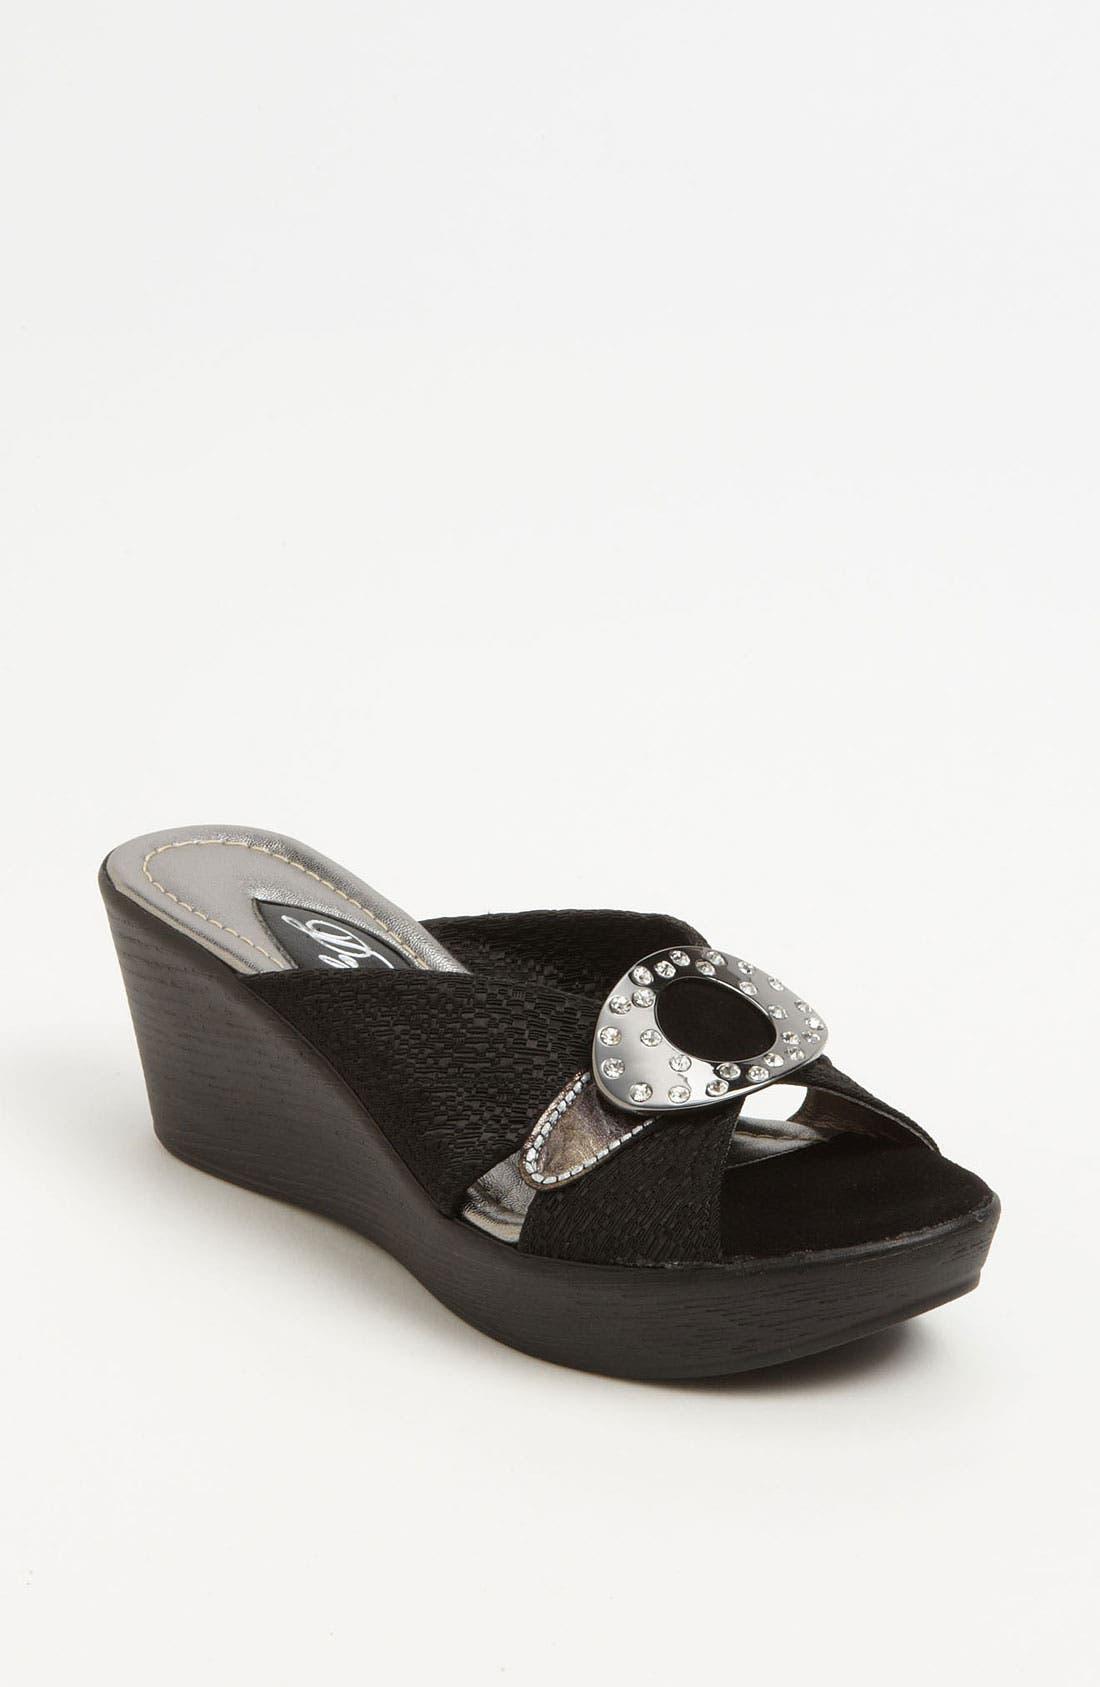 Main Image - Dezario 'Pepi' Sandal